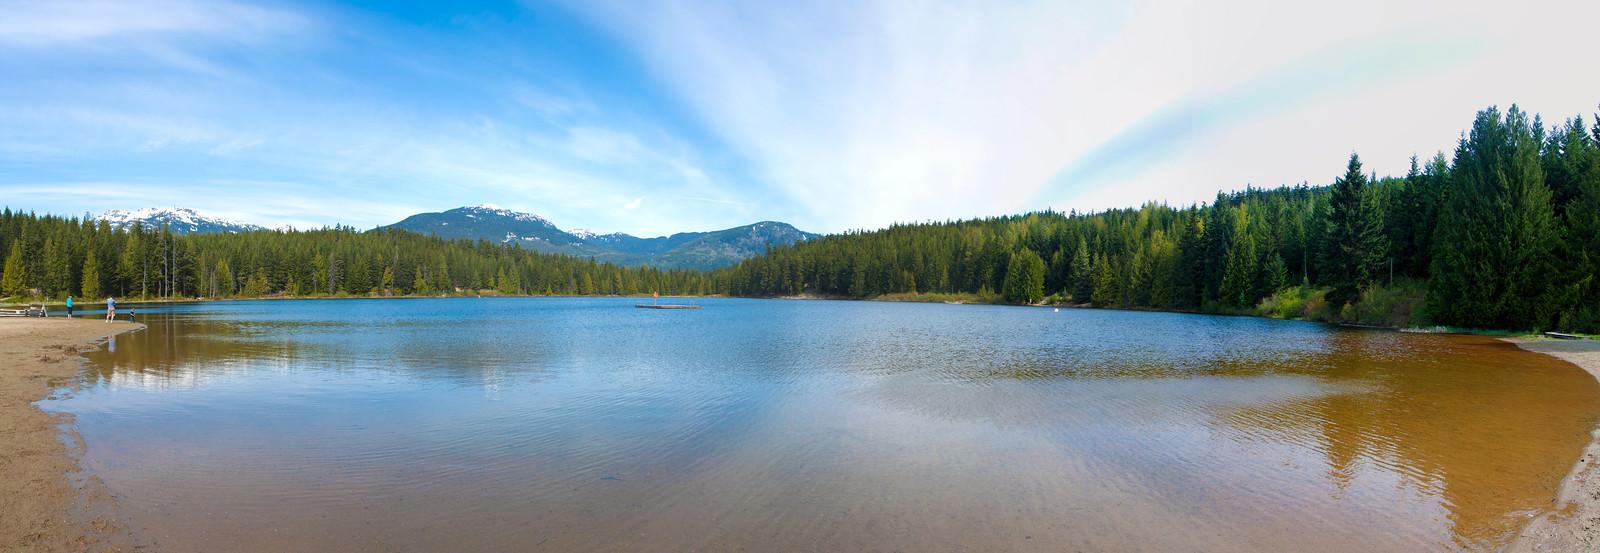 Lost lake, Whistler, CA